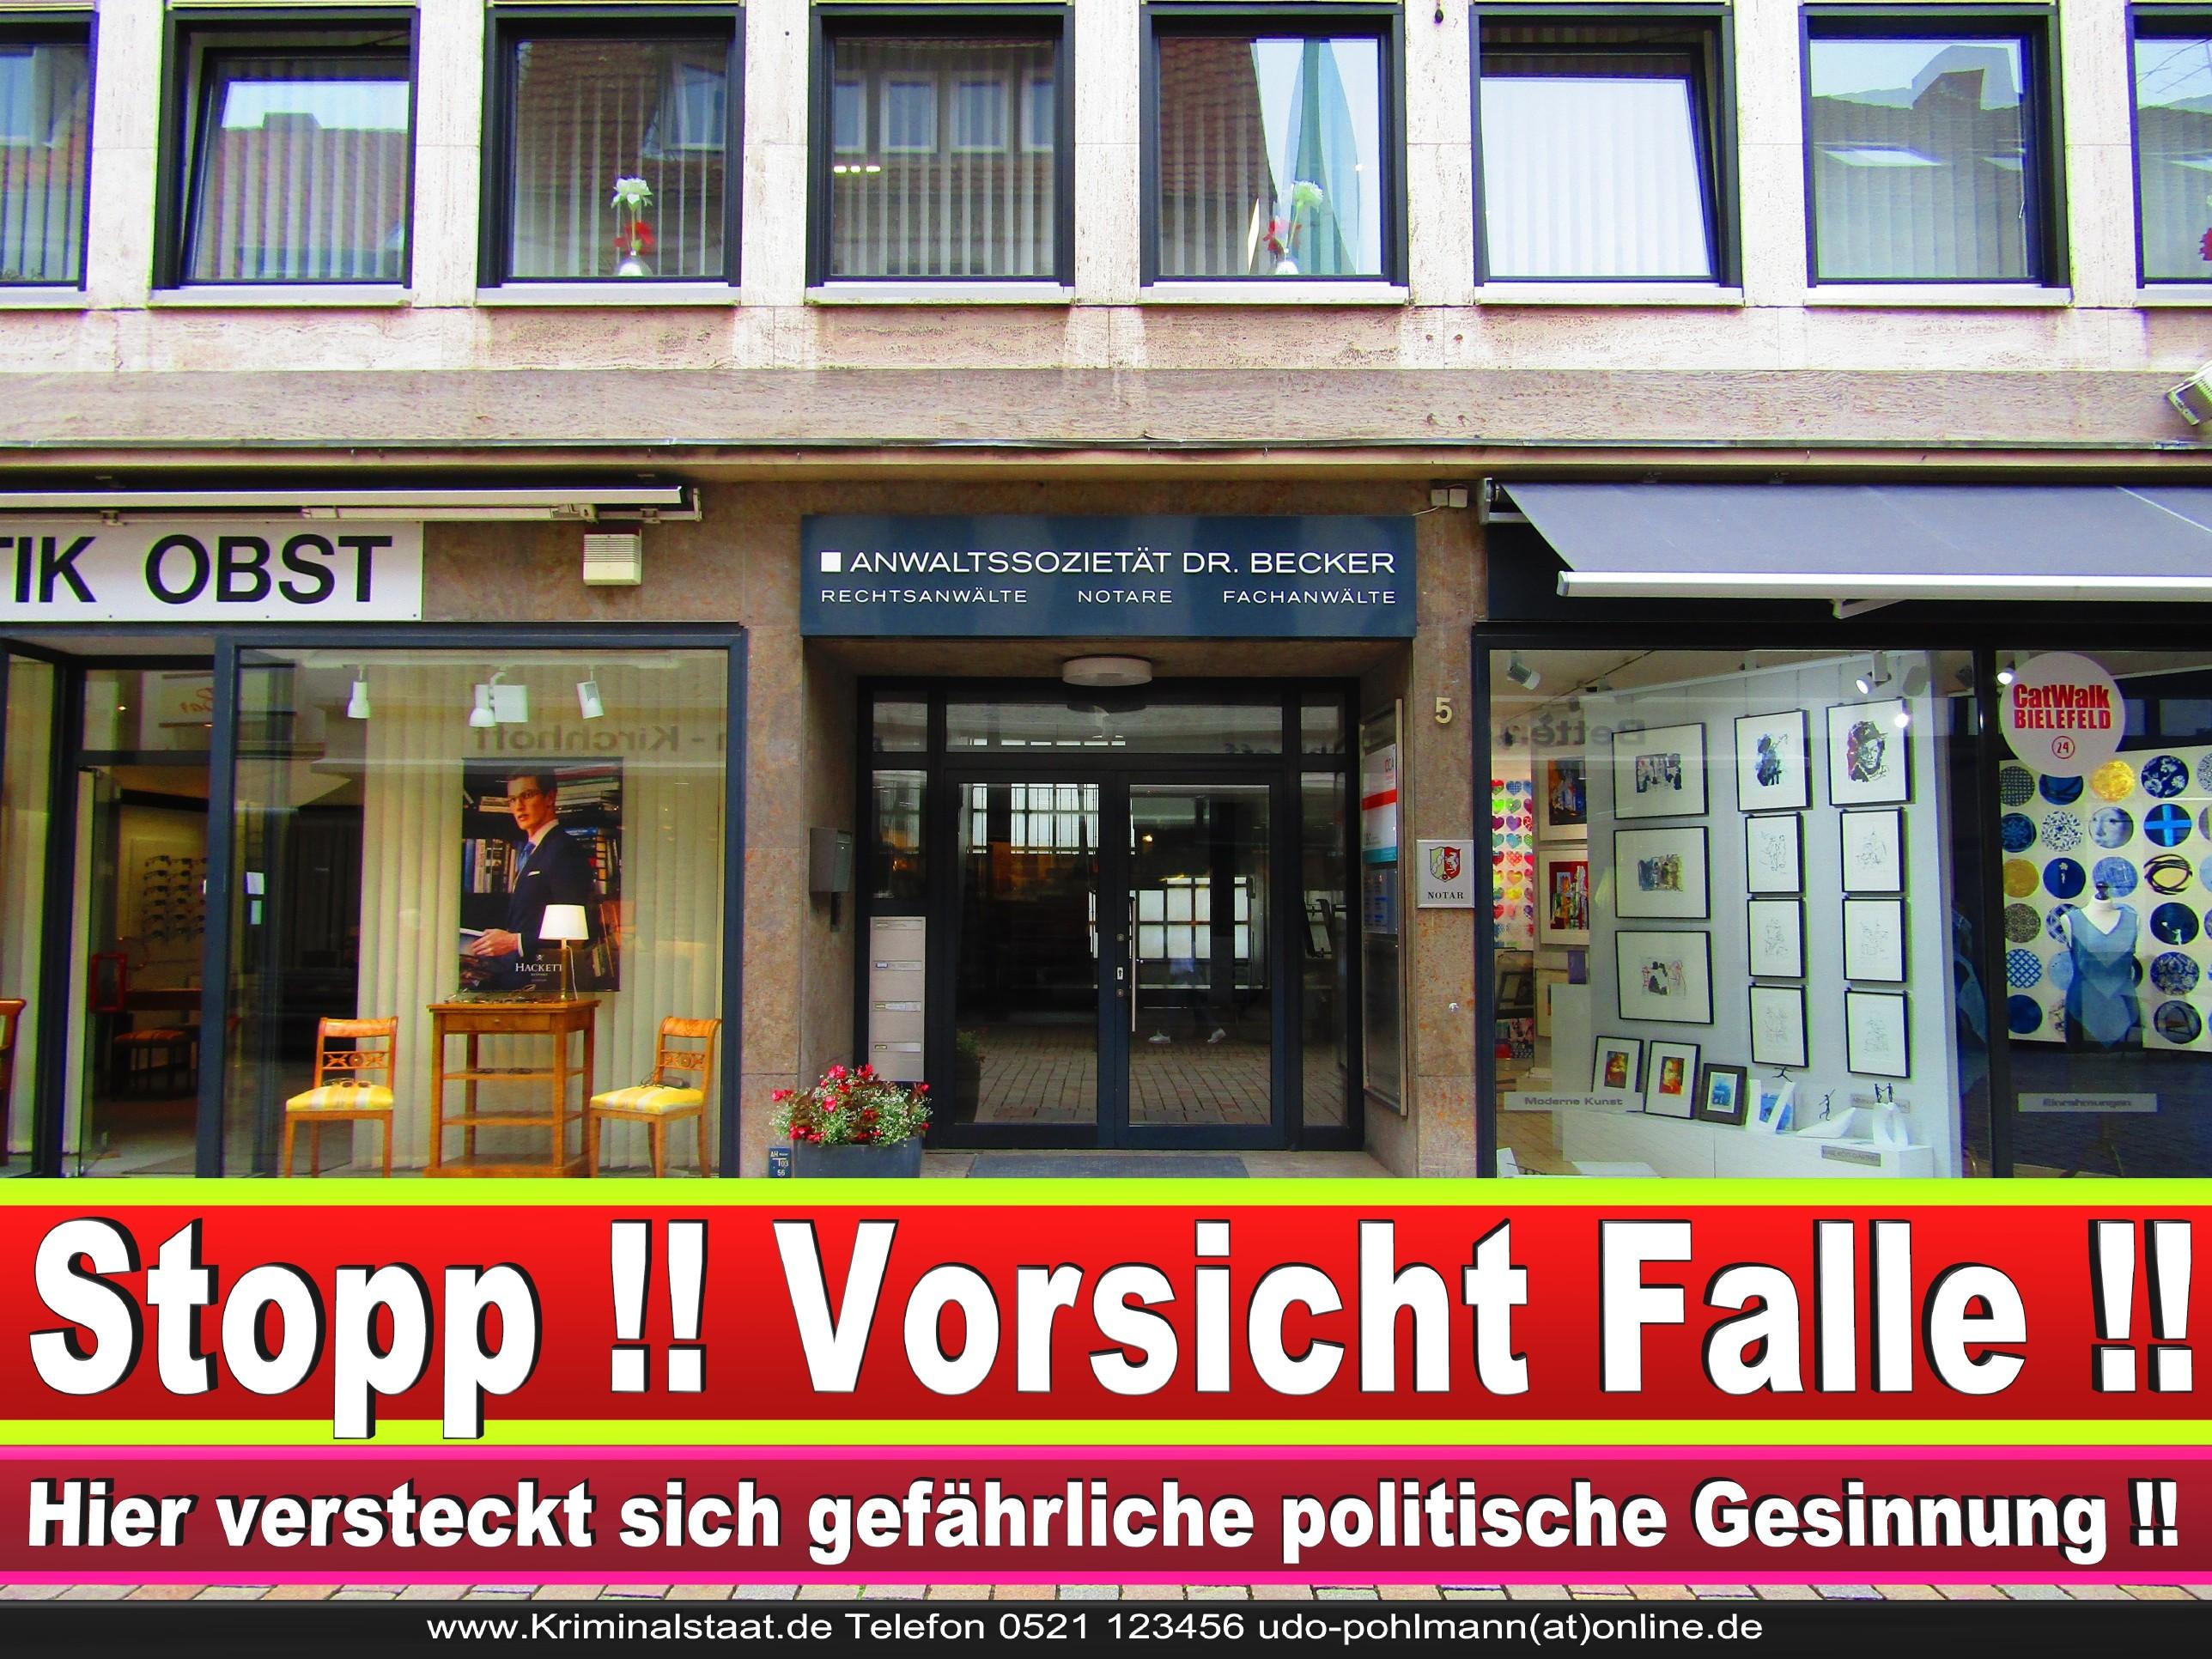 RECHTSANWALT DR THORSTEN FELDMANN CDU BIELEFELD Rechtsanwalt Und Notar A D Werner Kaup 3 LANDTAGSWAHL BUNDESTAGSWAHL BÜRGERMEISTERWAHL